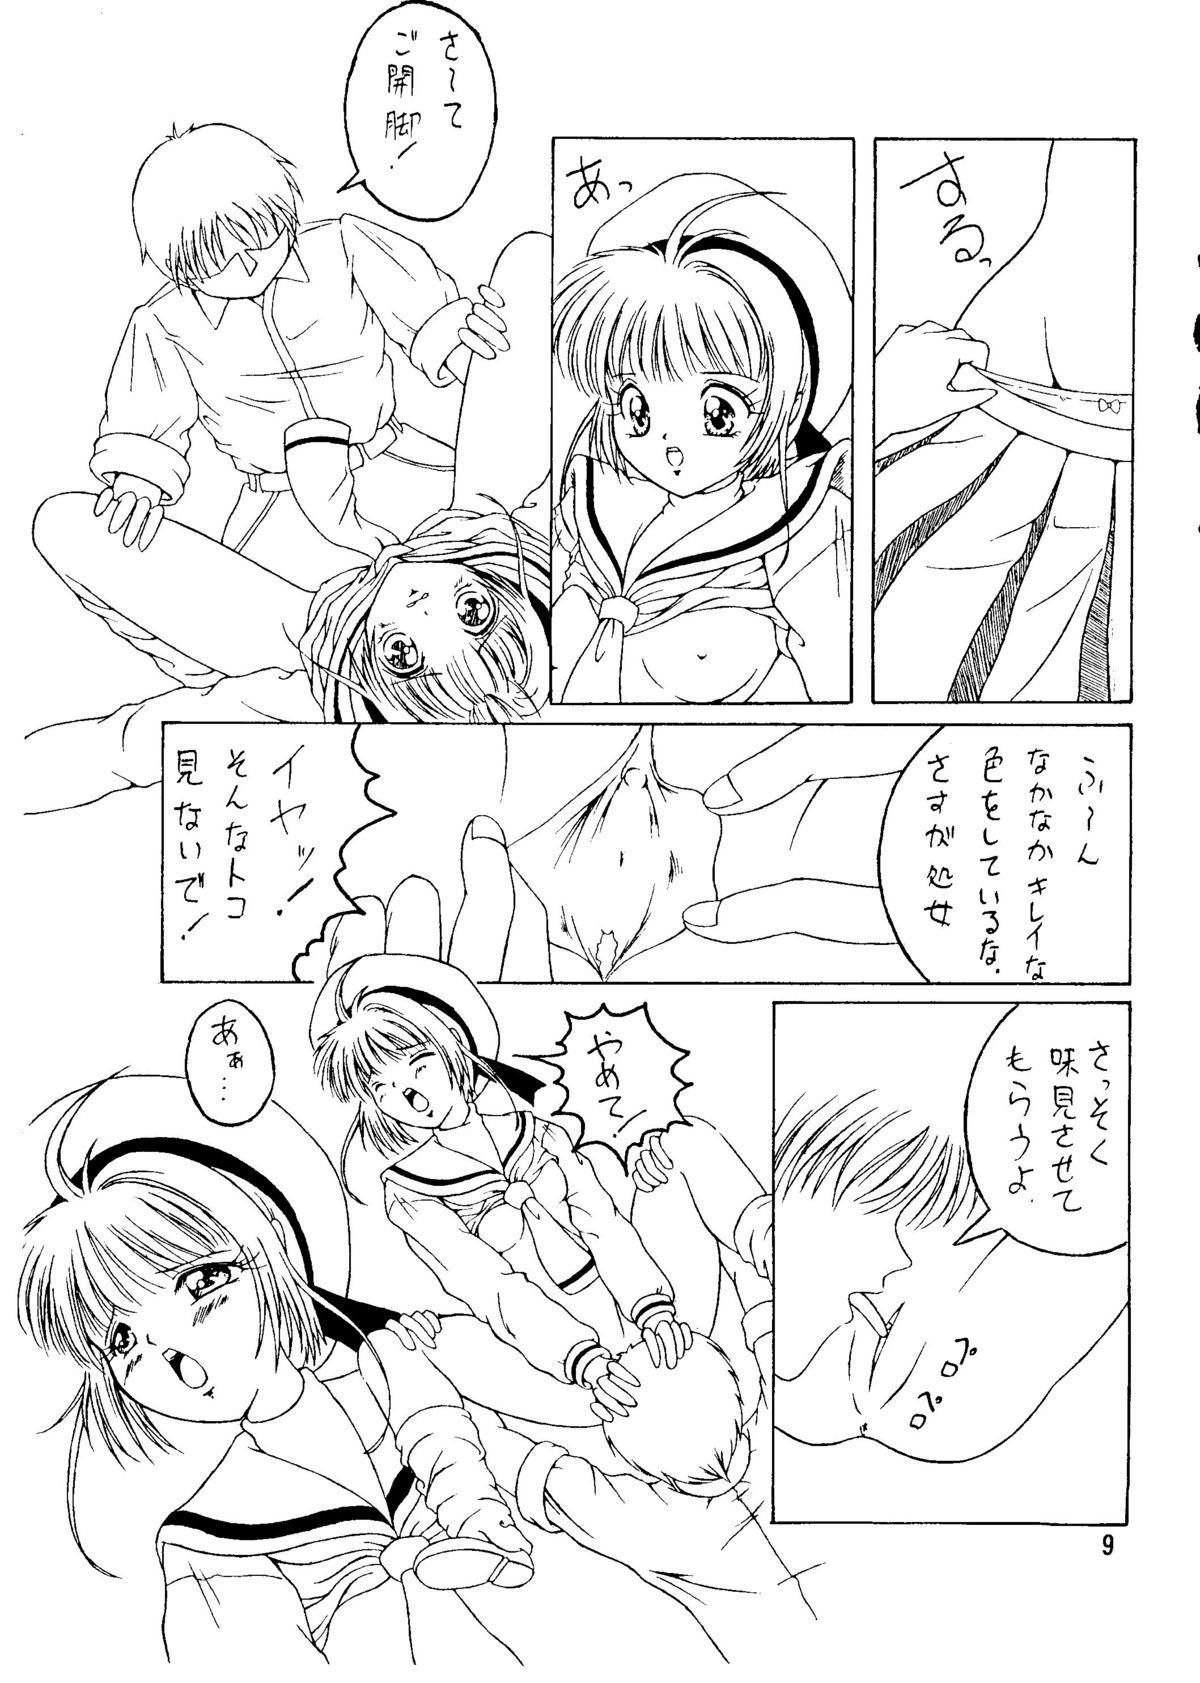 Dandyism 4 (To Heart, Card Captor Sakura, White Album] 10